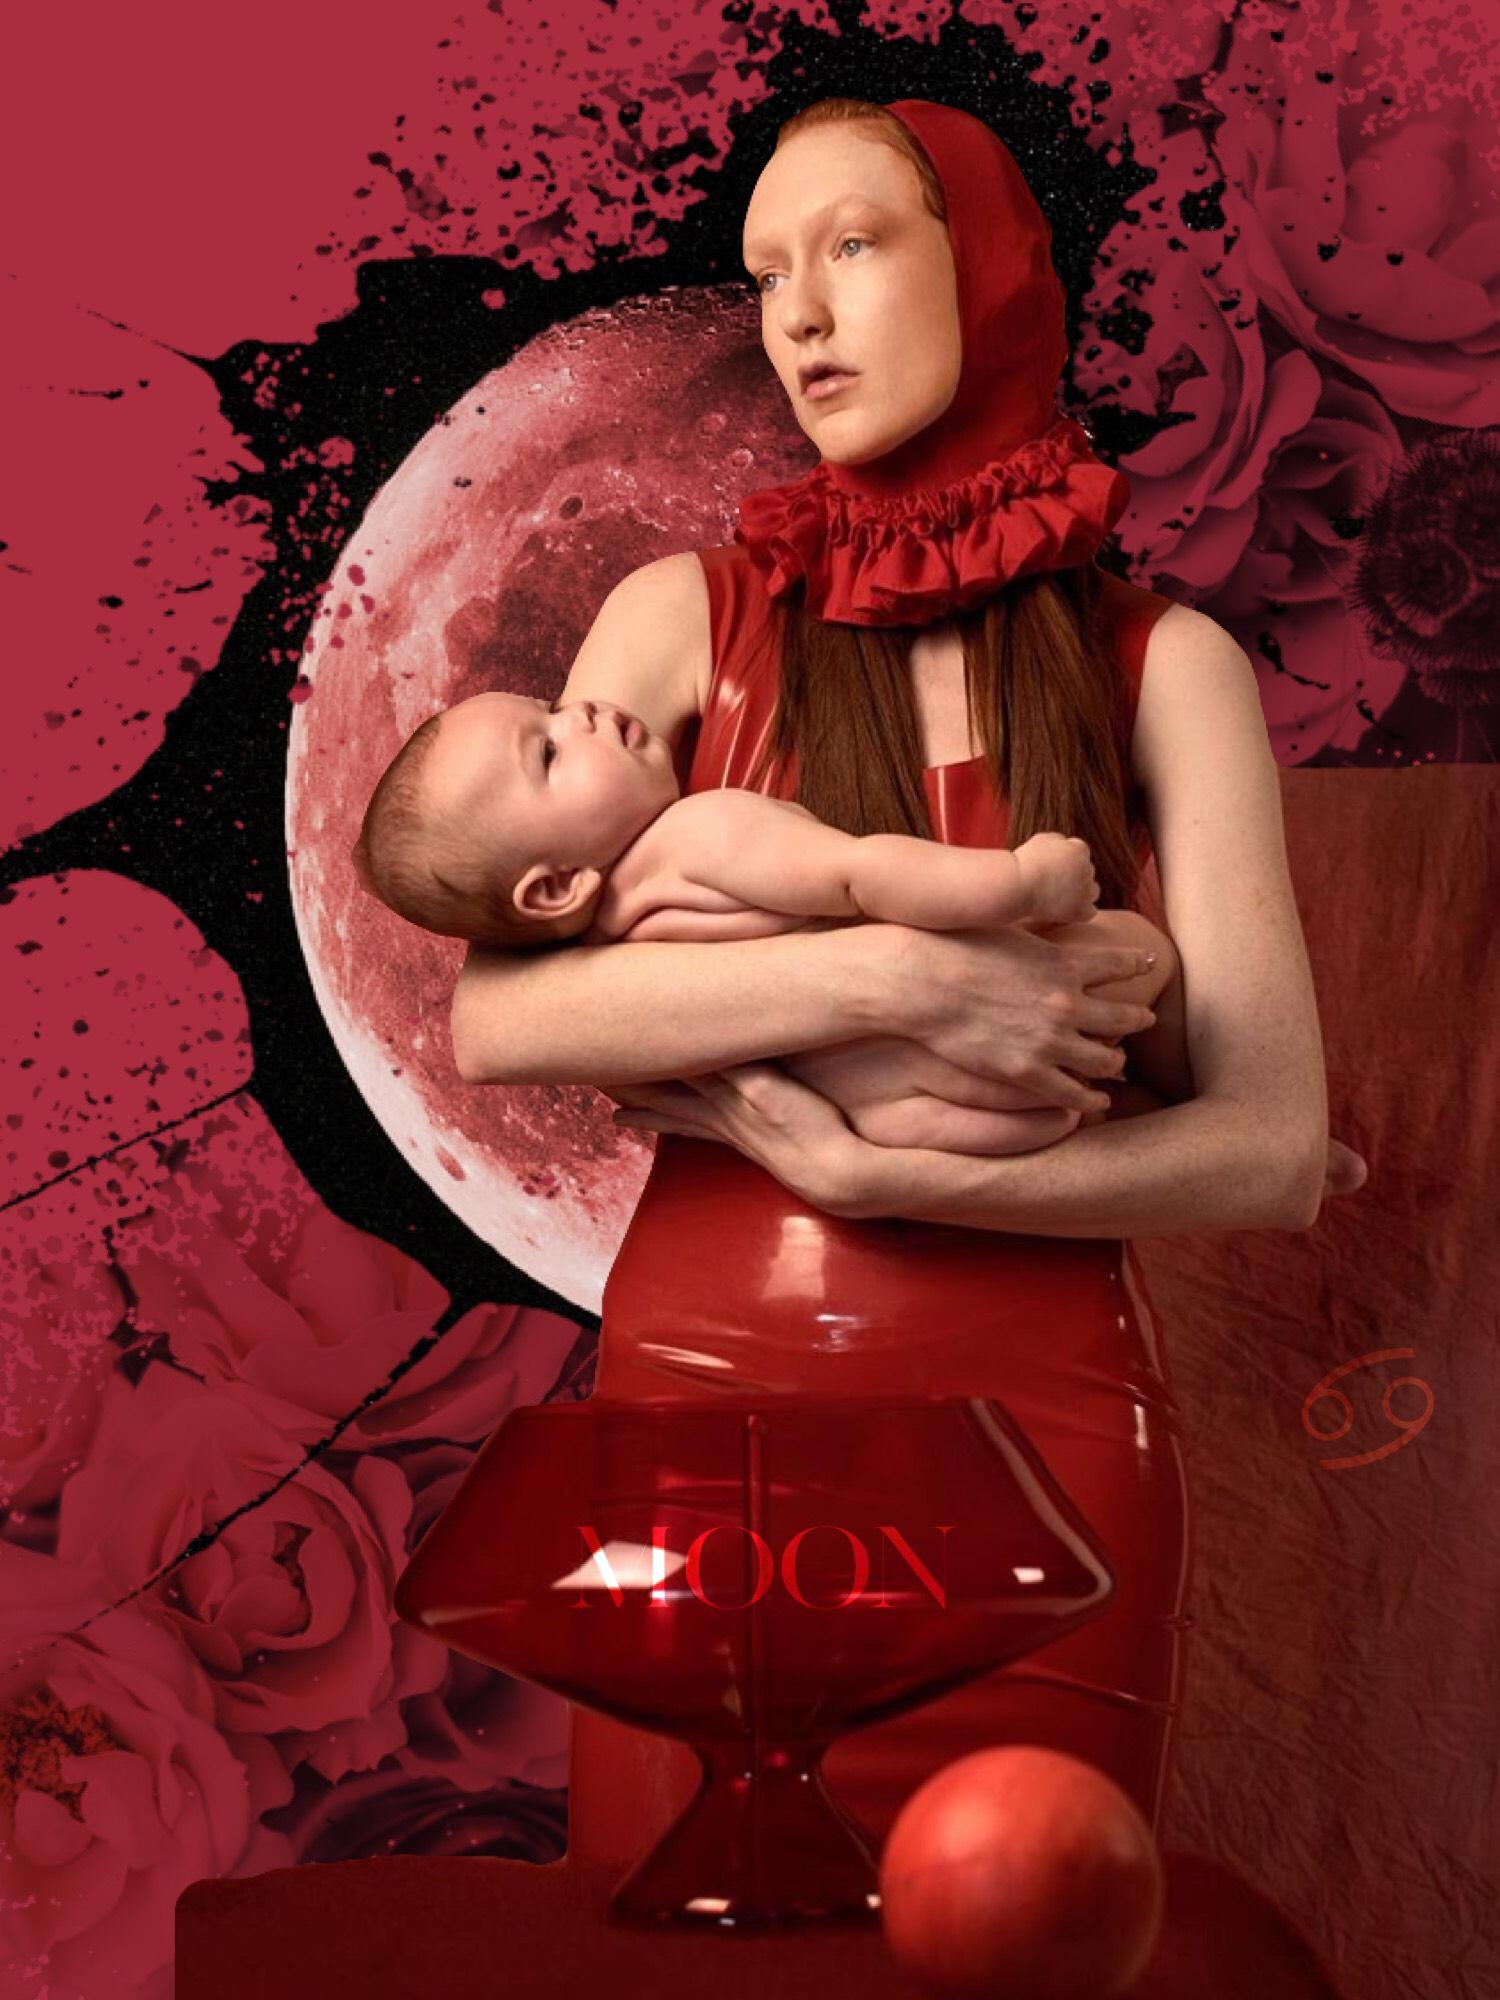 Latex Dress Deapagana Latex Couture  Cap Daria D'ambrosio  Armonic Cup Franco Rossi / Moon Cup